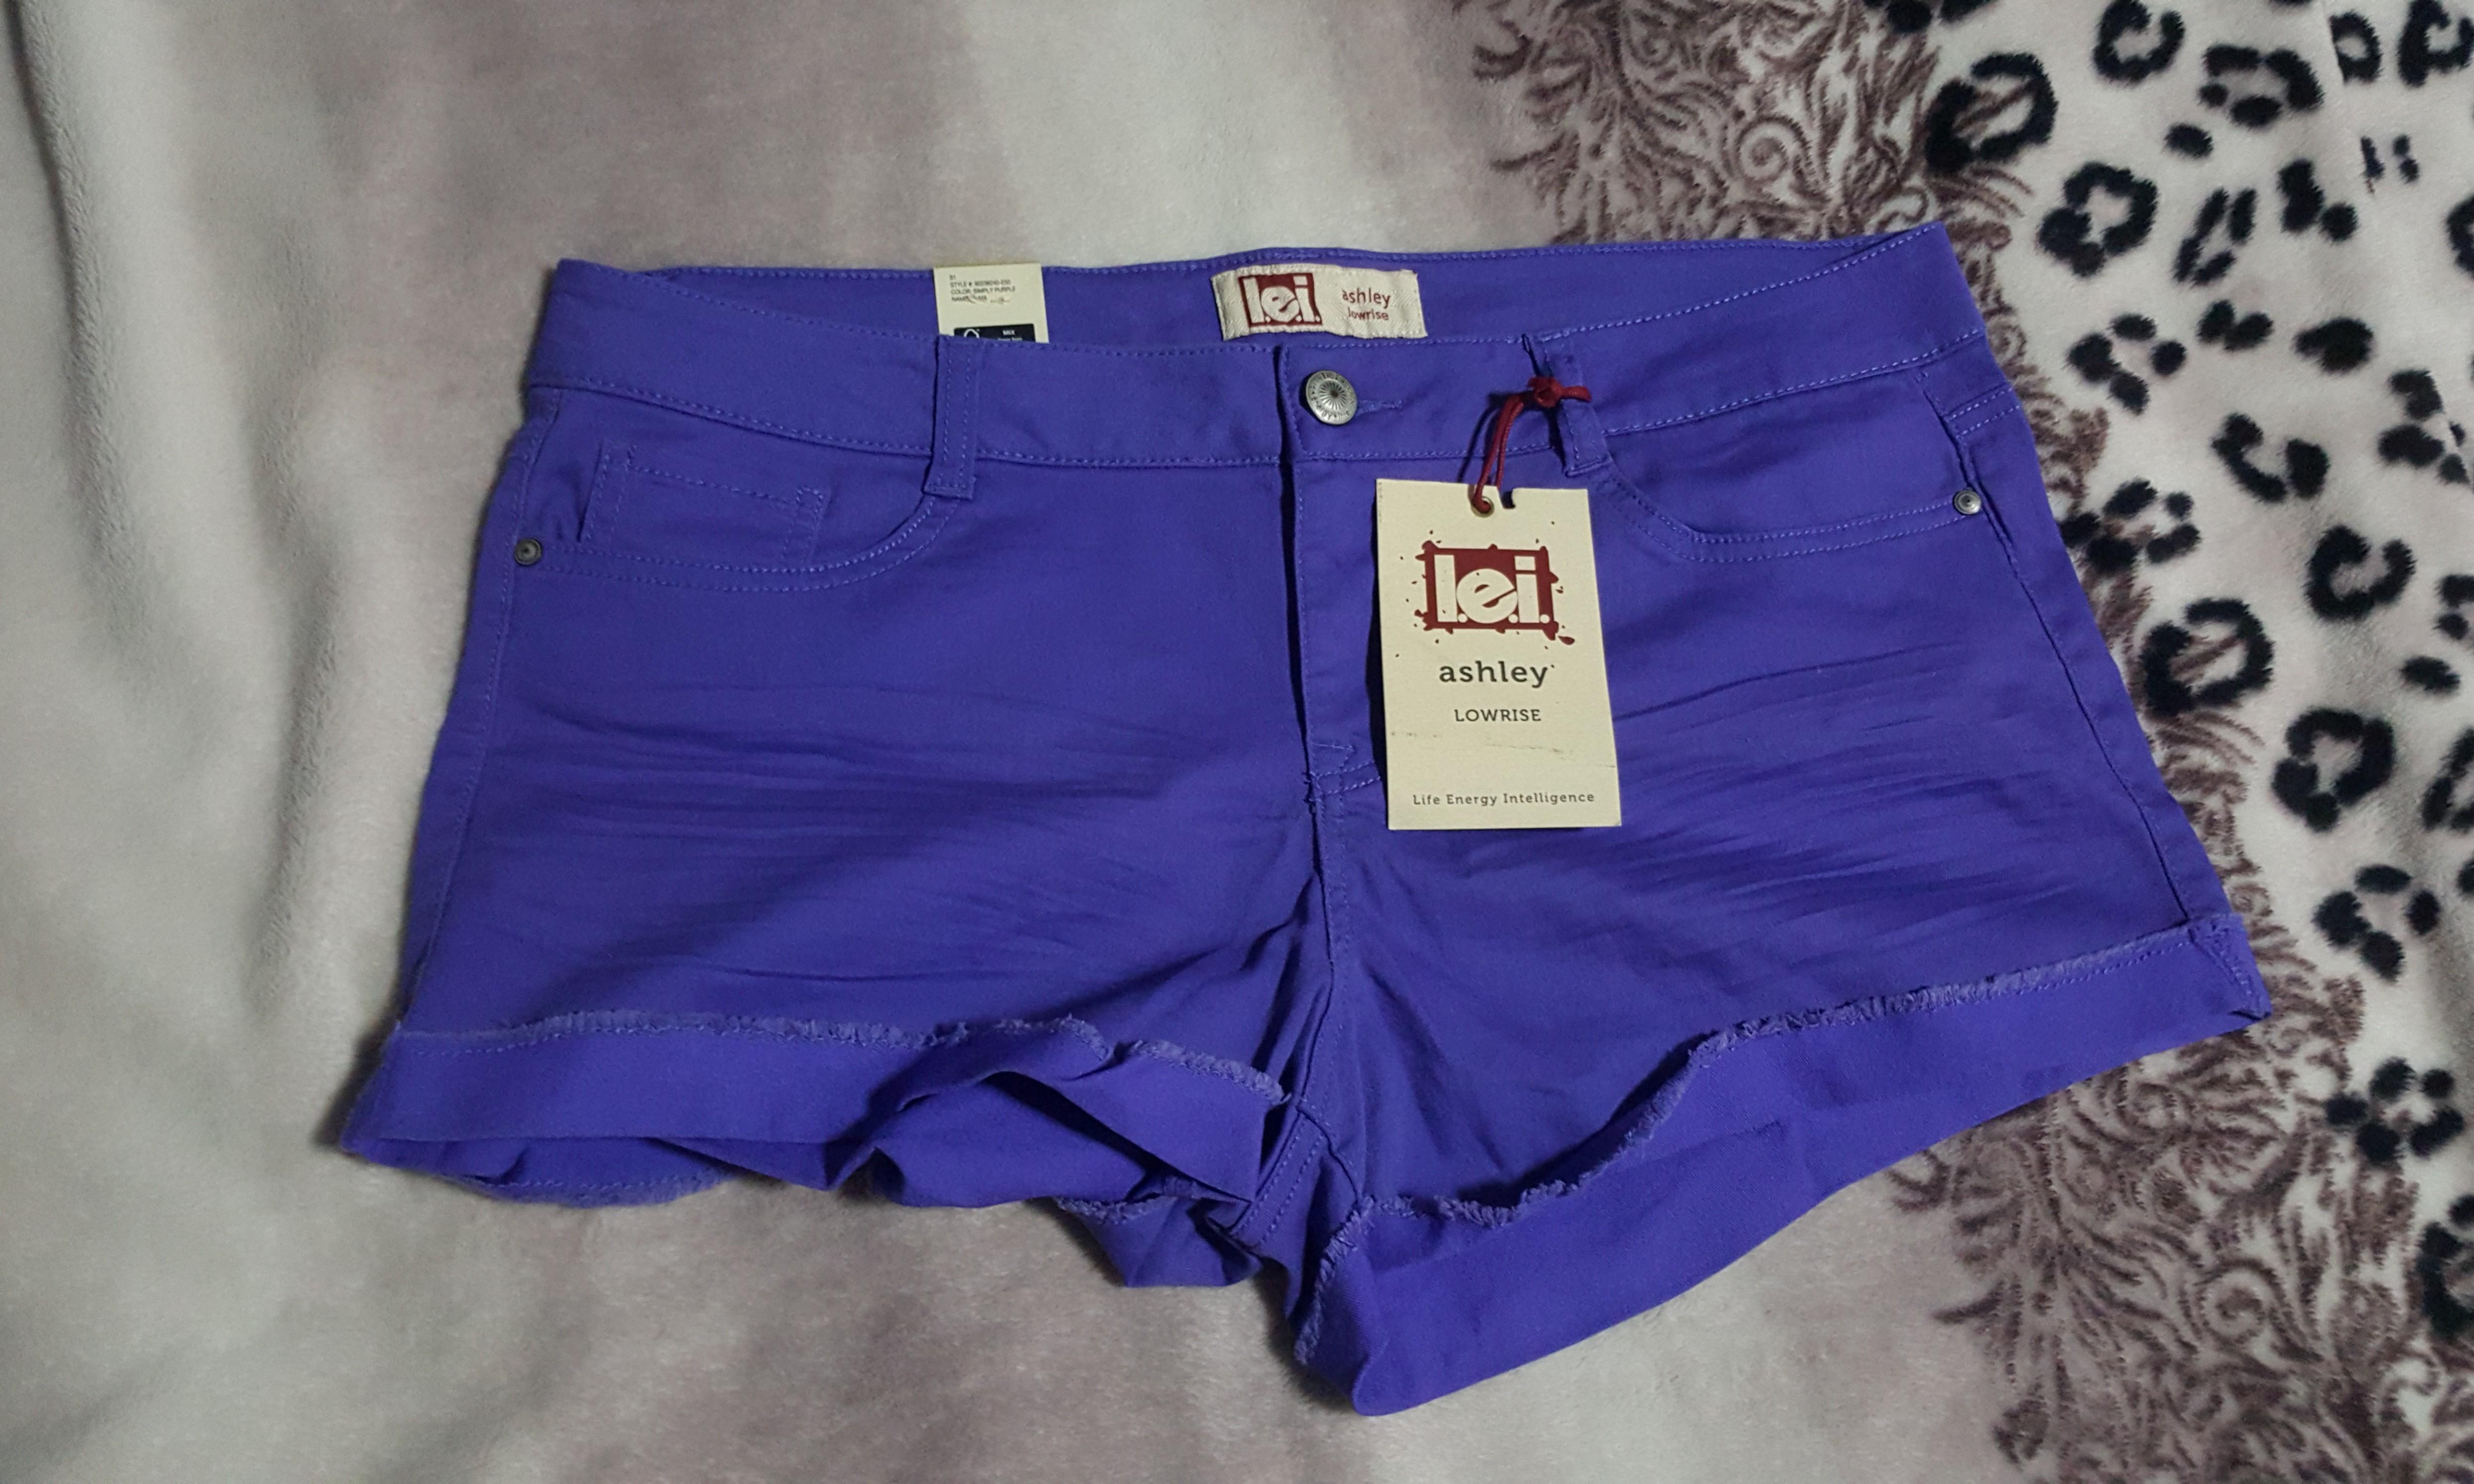 568641c7ab1d4 BNWT Lei Plus Size Lowwrise Purple Shorts 💕